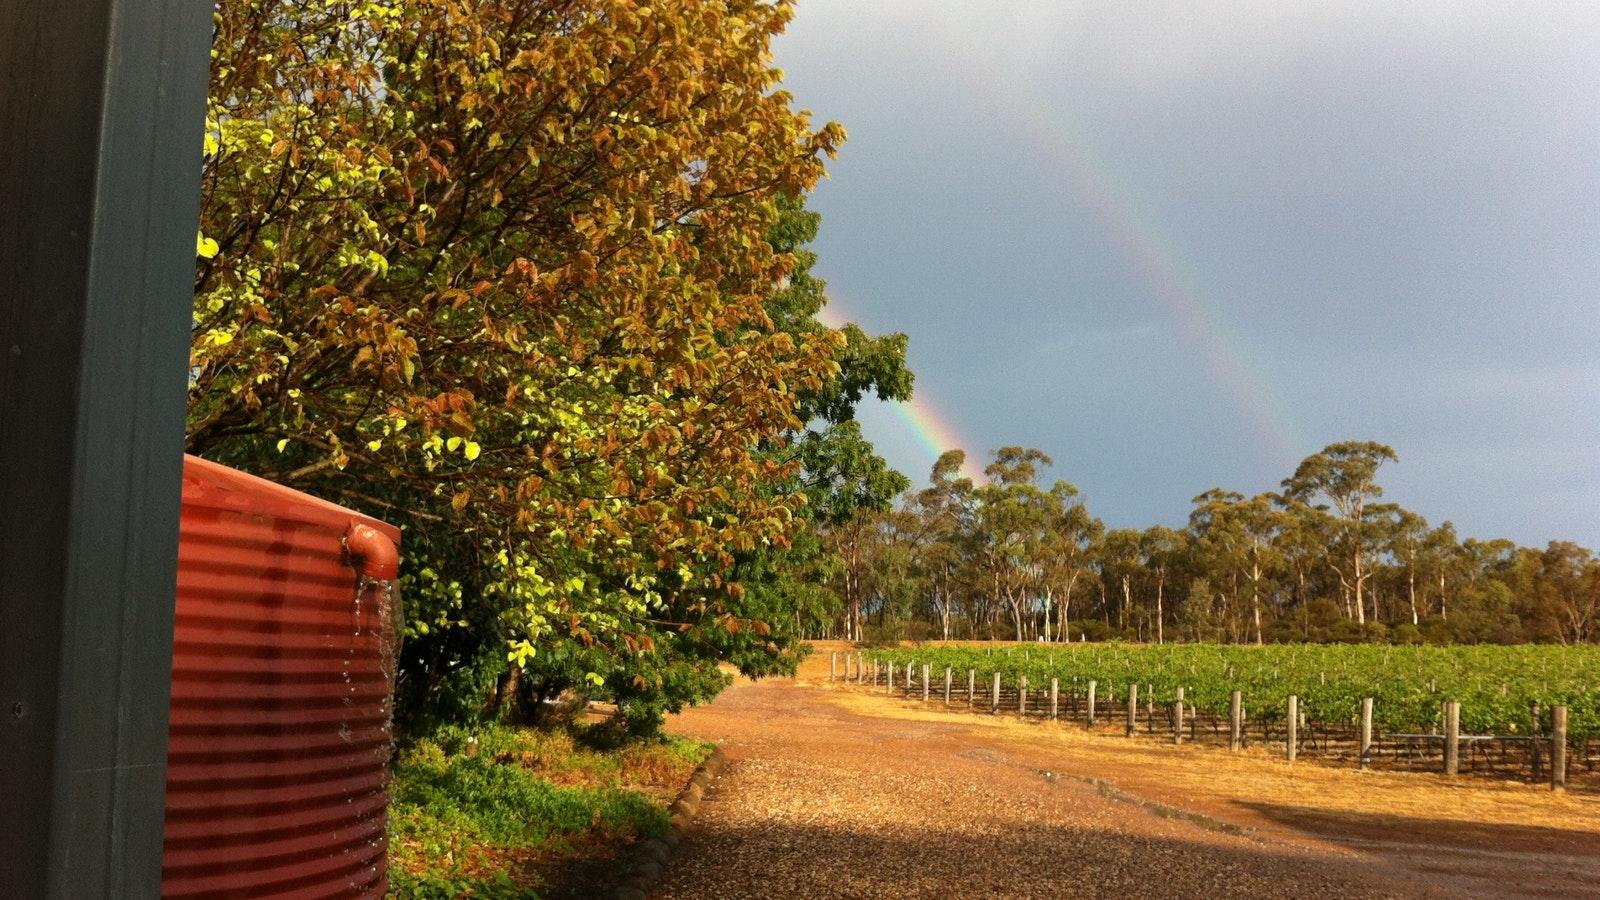 Rainbow follows some welcome rain